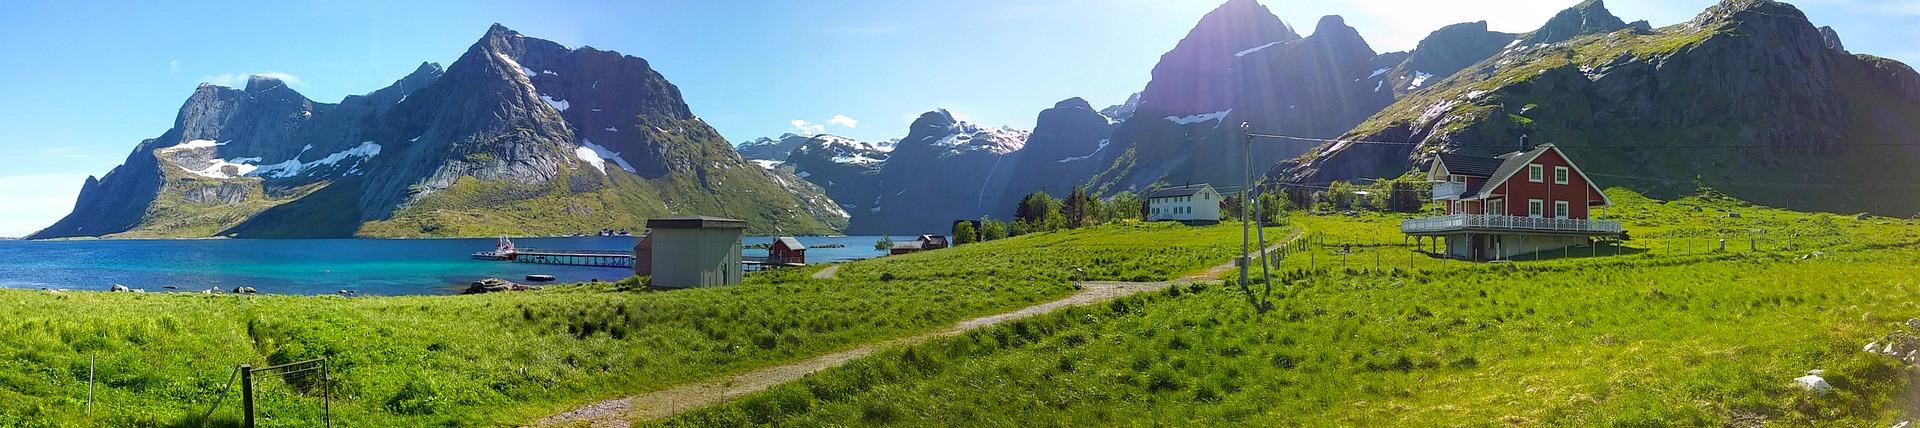 Mini Tour dei Fiordi